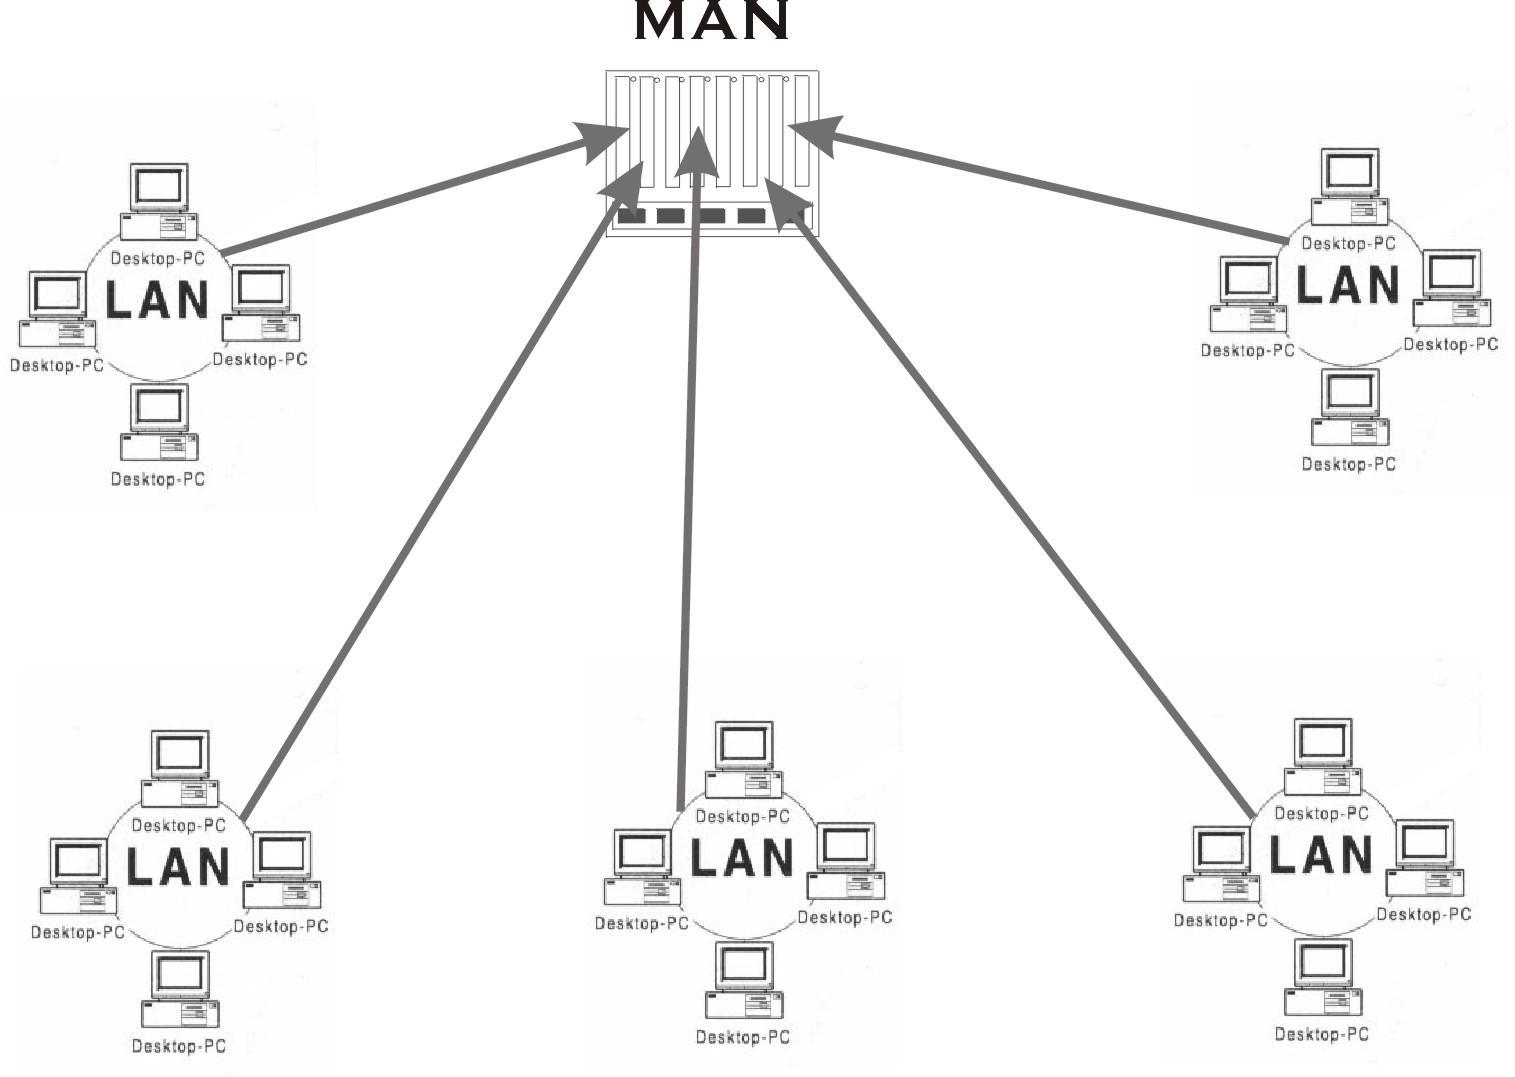 Hayatul Fikry Bab 2 Perangkat Jaringan Dan Koneksi Internet